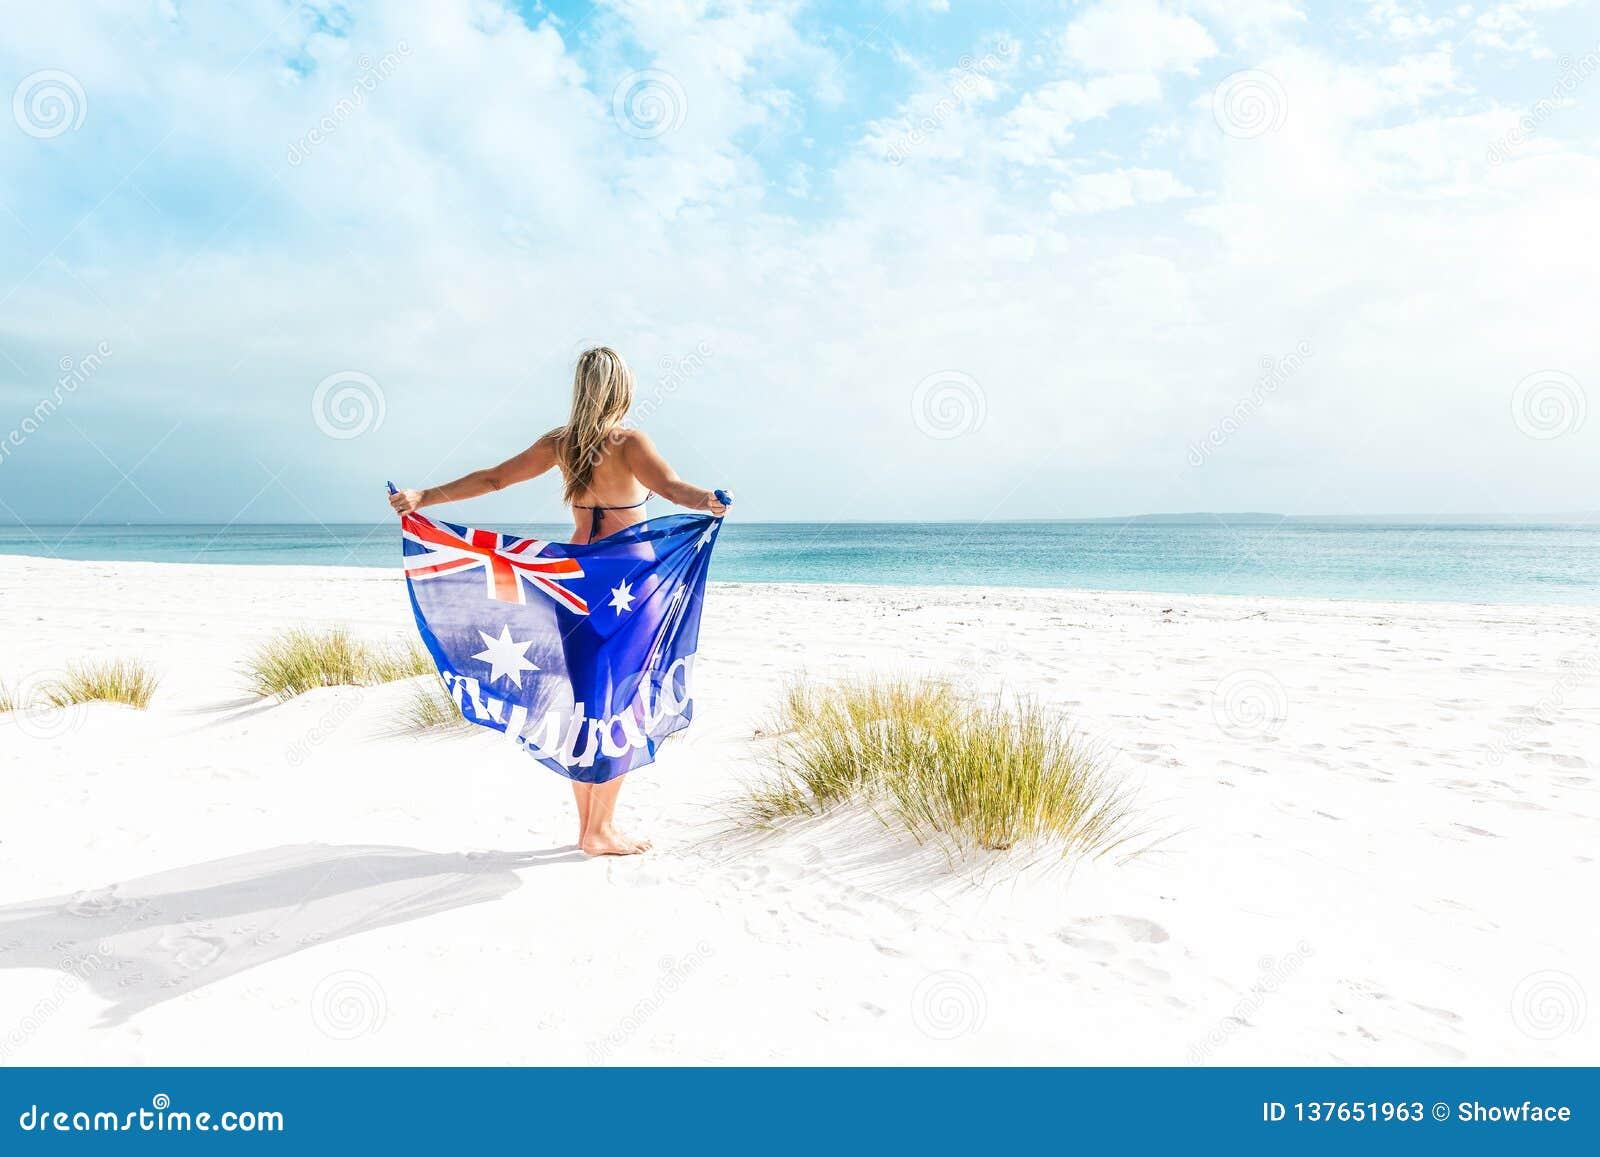 Suntanned woman on beautiful beach in Australia